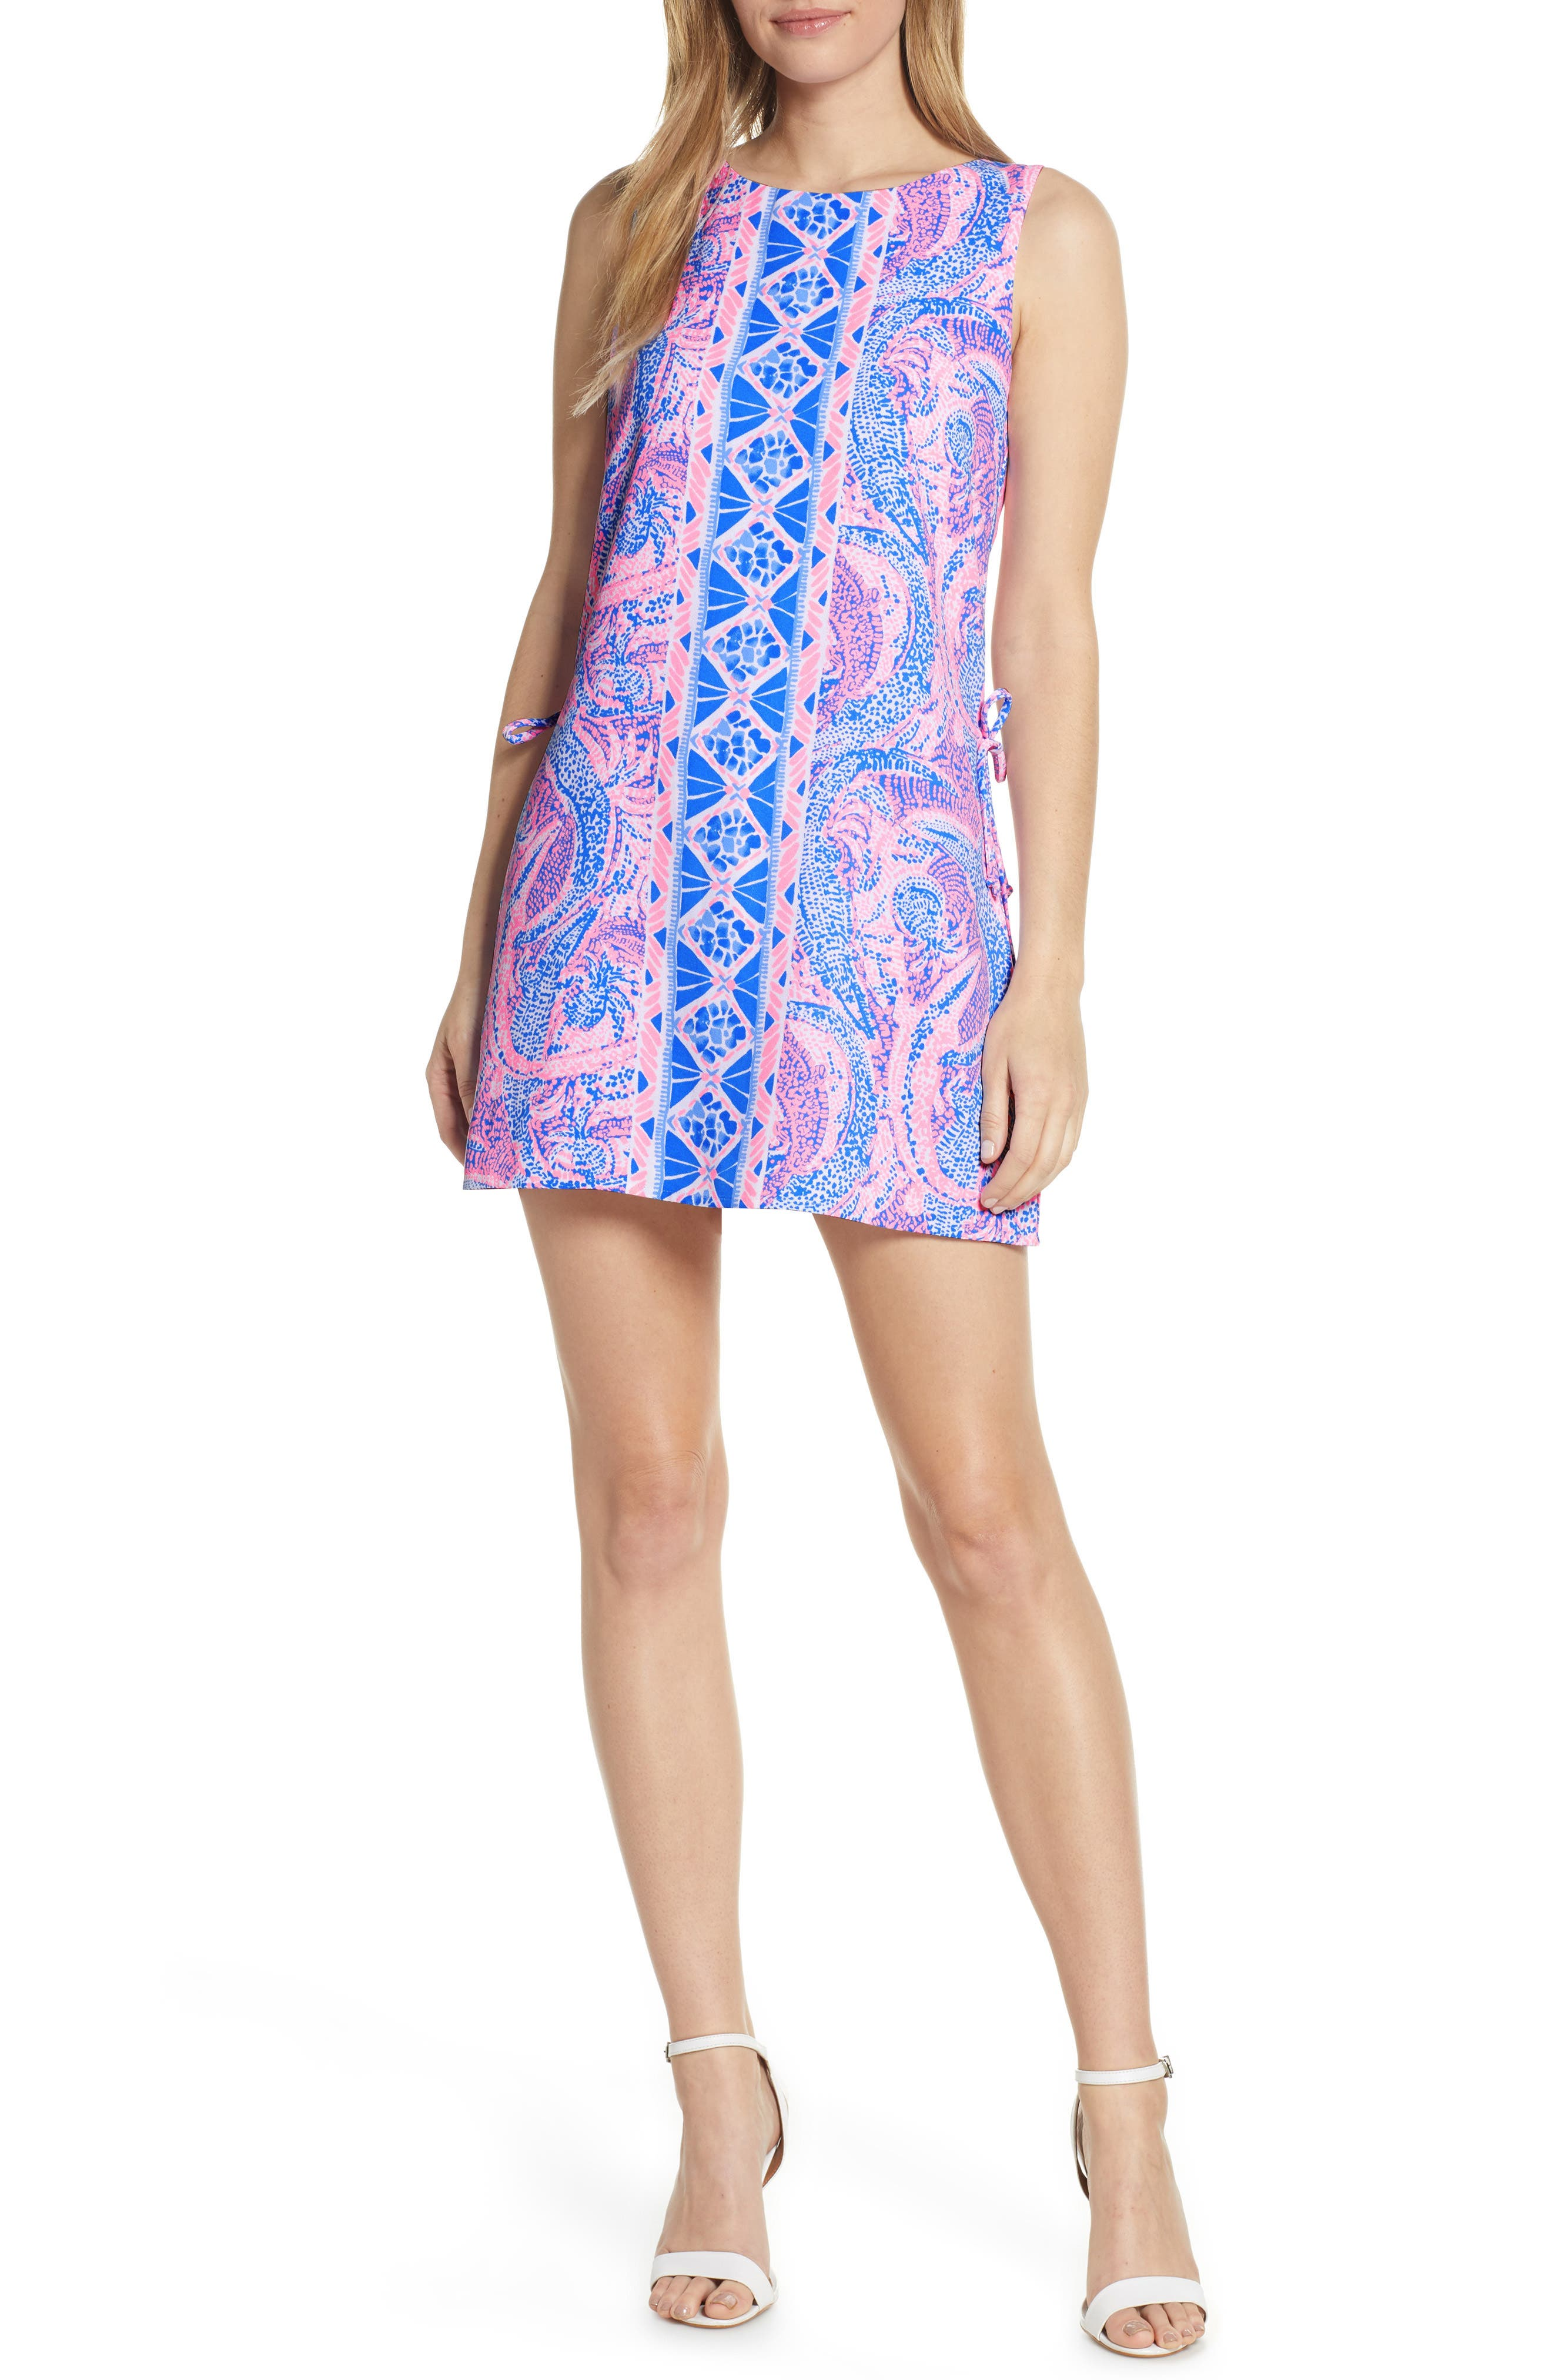 LILLY PULITZER<SUP>®</SUP>, Donna Romper Dress, Main thumbnail 1, color, COASTAL BLUE MAYBE GATO